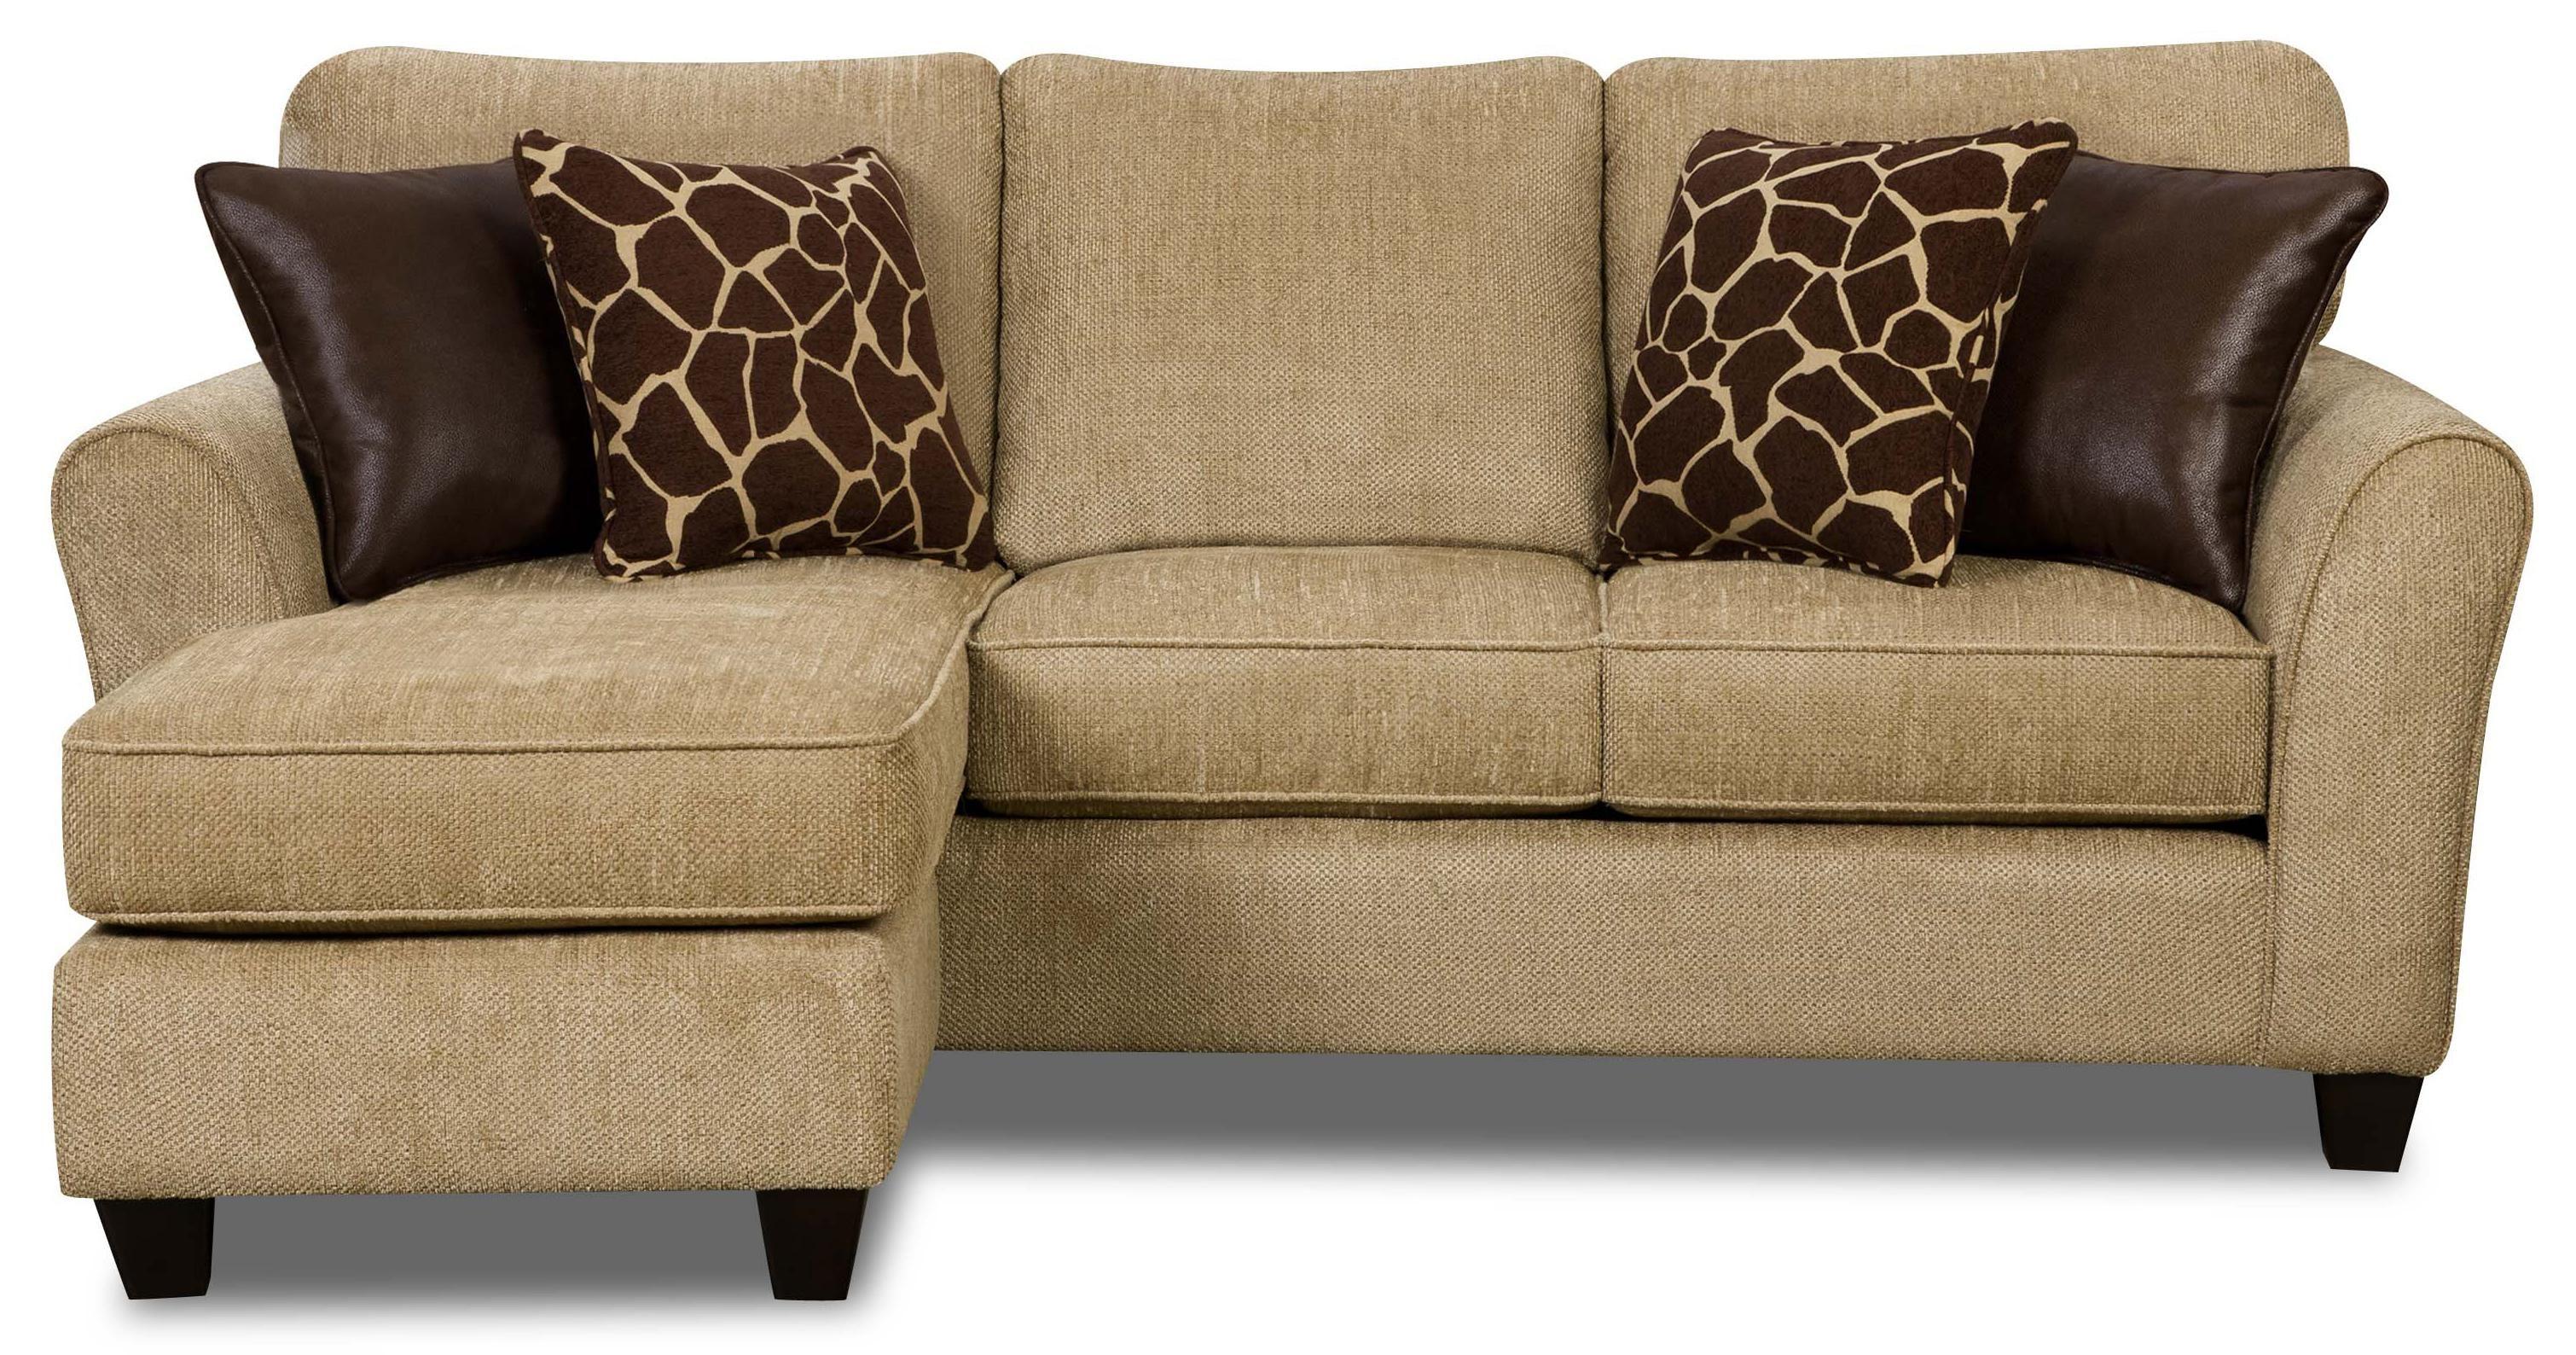 Best of sectional sofa kijiji oshawa sectional sofas for Chaise bercante kijiji